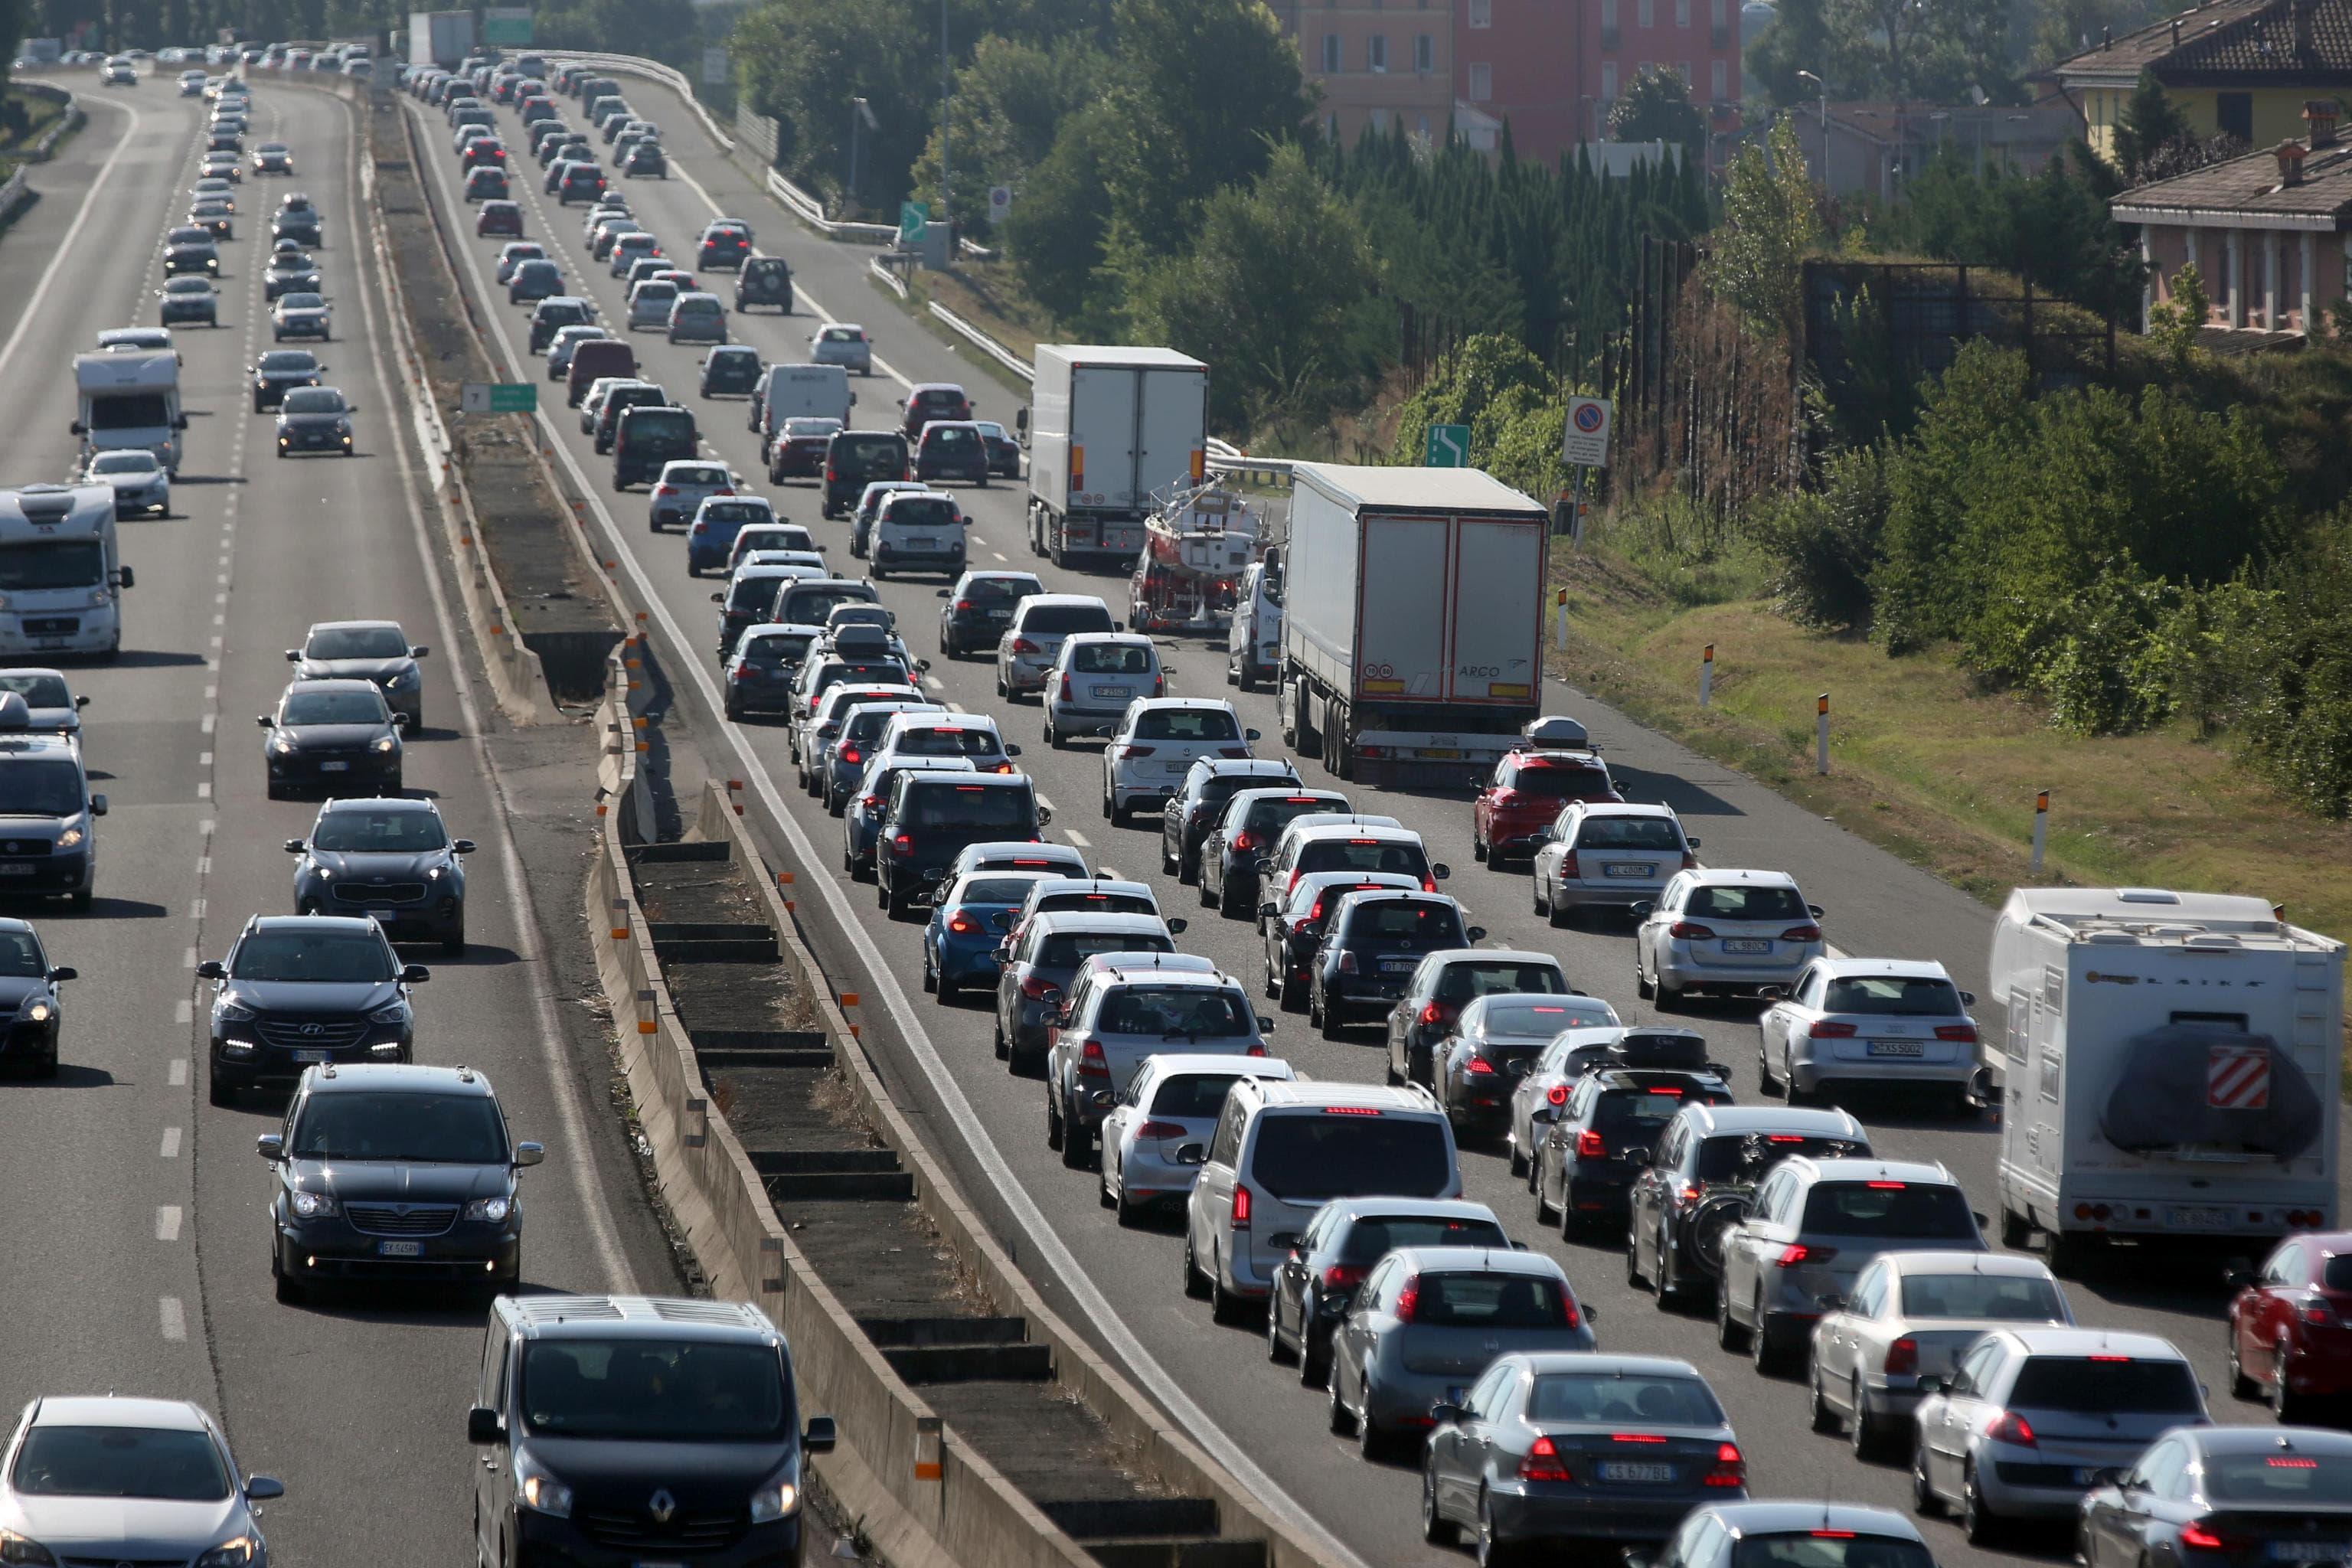 traffico-autostrada-ansa-4-2